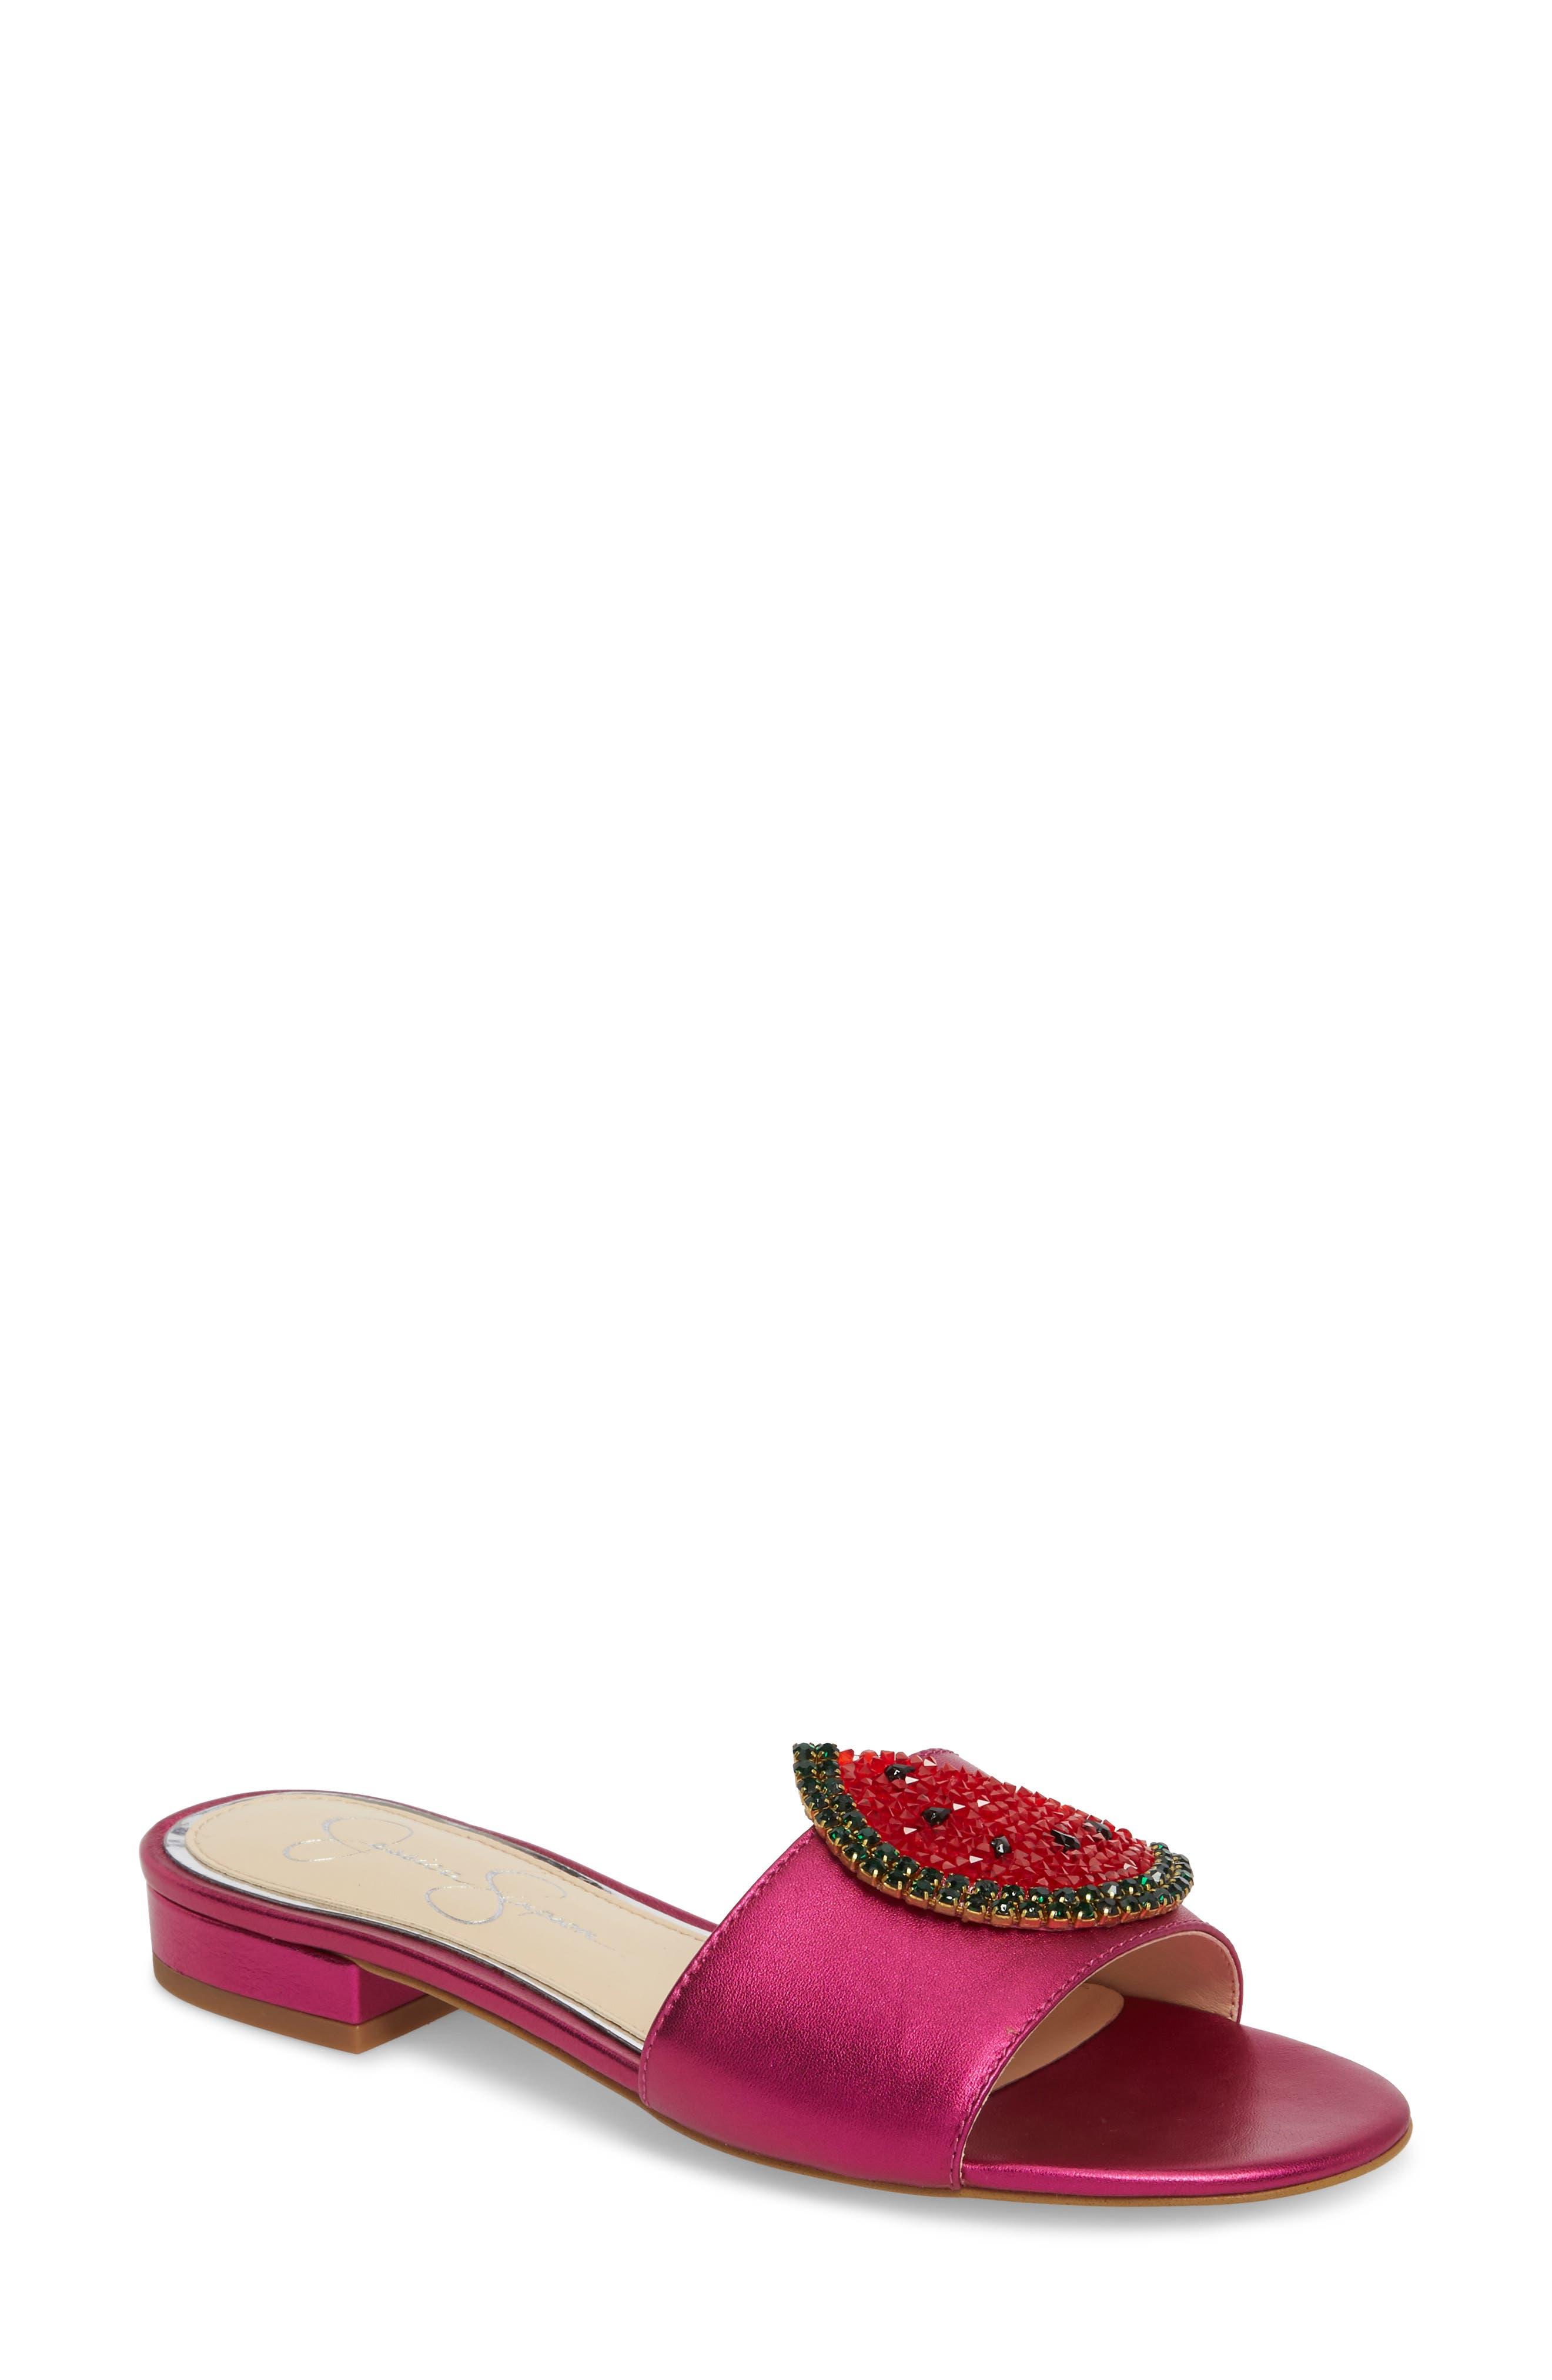 Jessica Simpson Crizma Embellished Slide Sandal (Women)